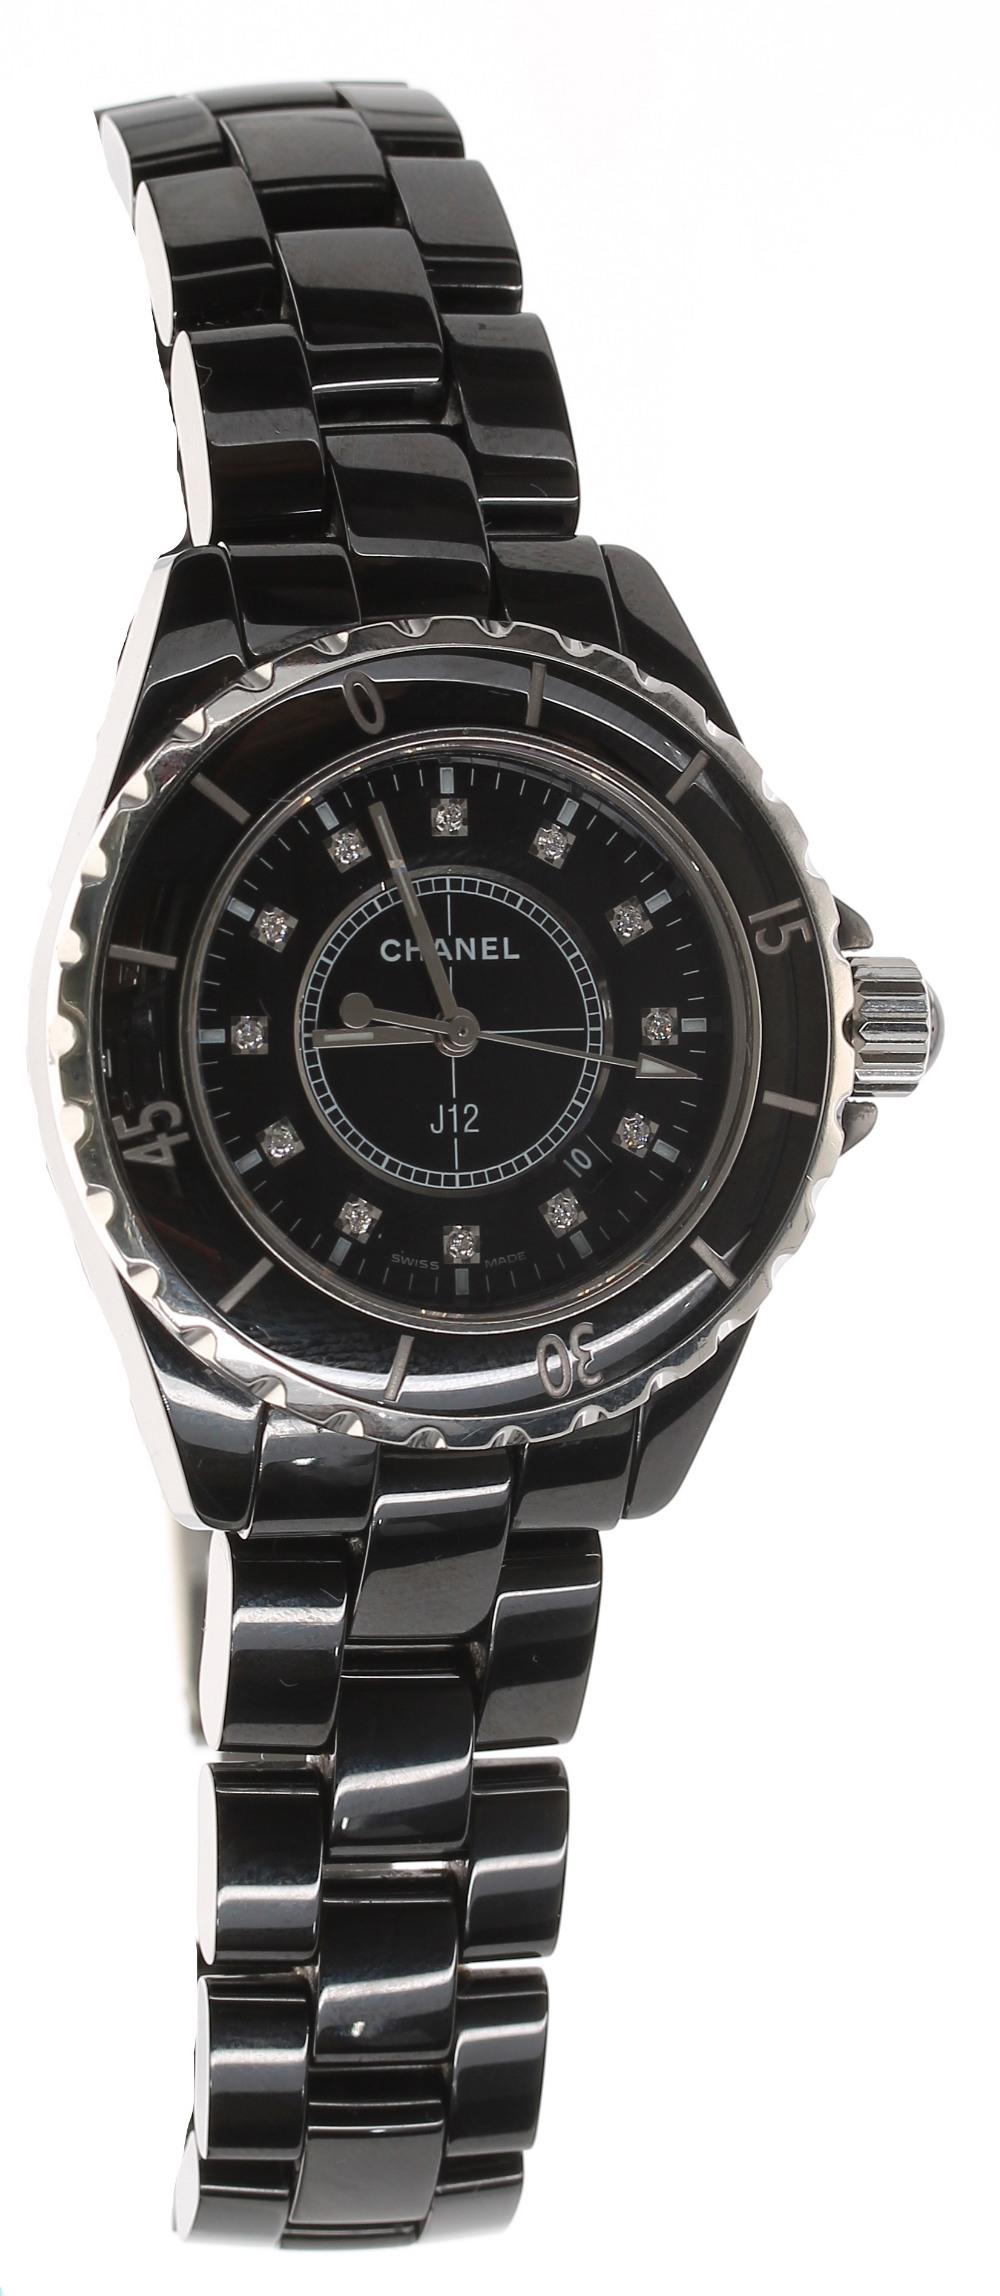 Chanel J12 black ceramic and stainless steel lady's bracelet watch, no. I.N. 70xxx, black dial